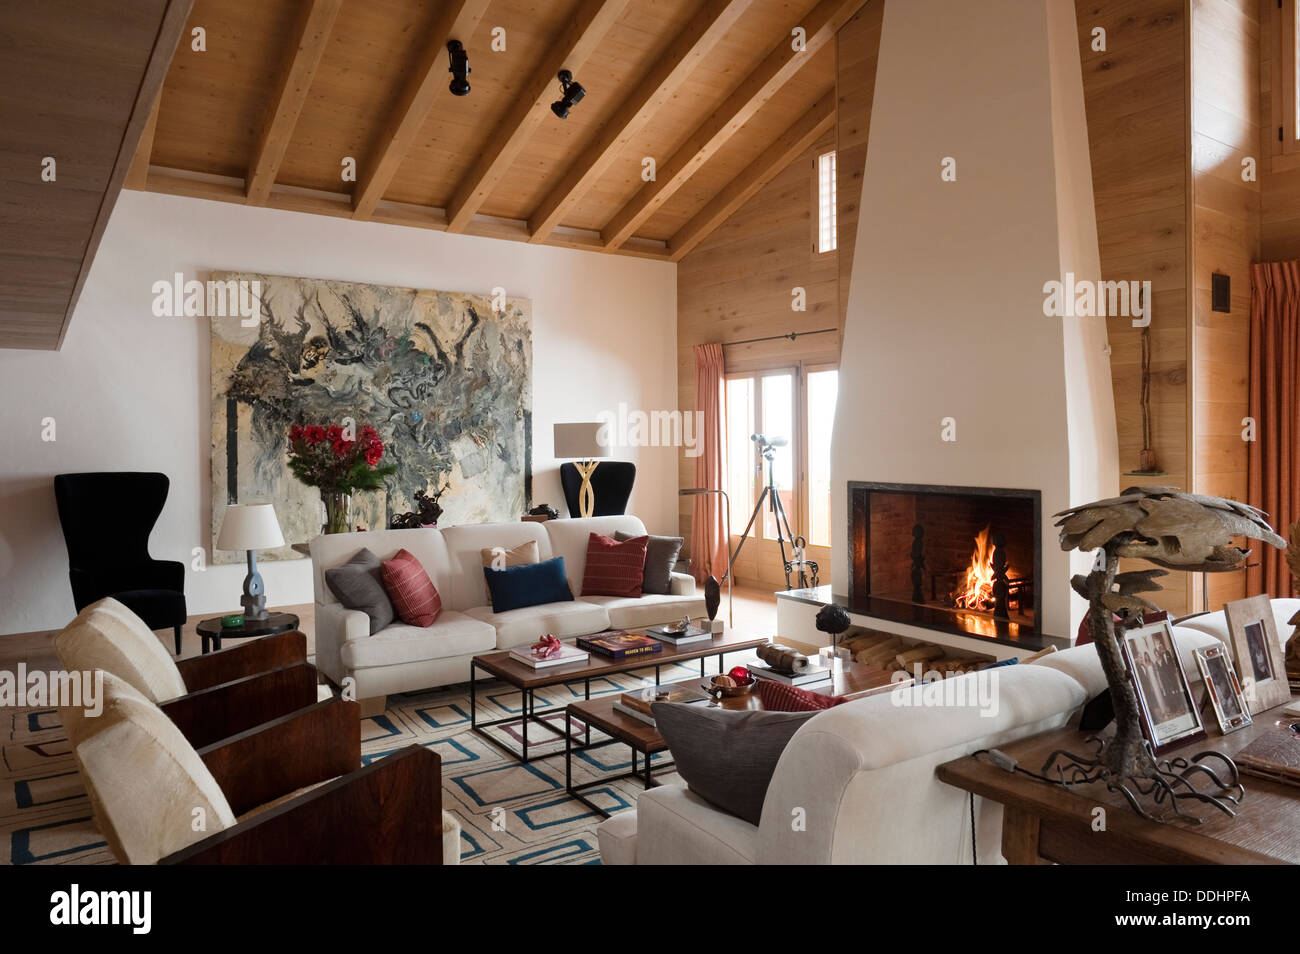 Chalet Interieur Stockfotos & Chalet Interieur Bilder - Alamy